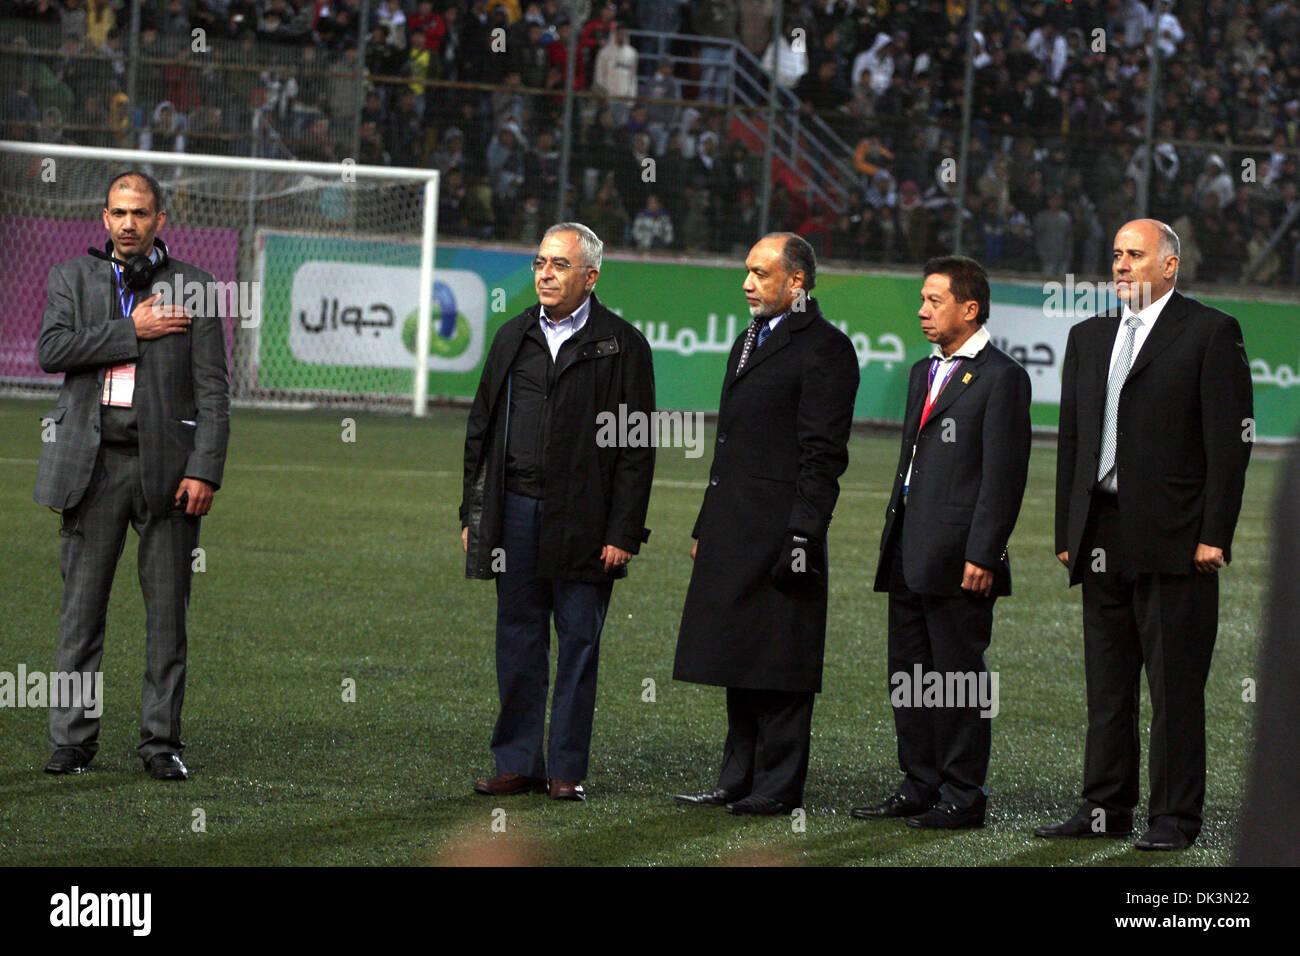 Mar 09, 2011 - Ramallah, West Bank, Palestinian Territory - Palestinian prime minister SALAM FAYYAD participate Stock Photo